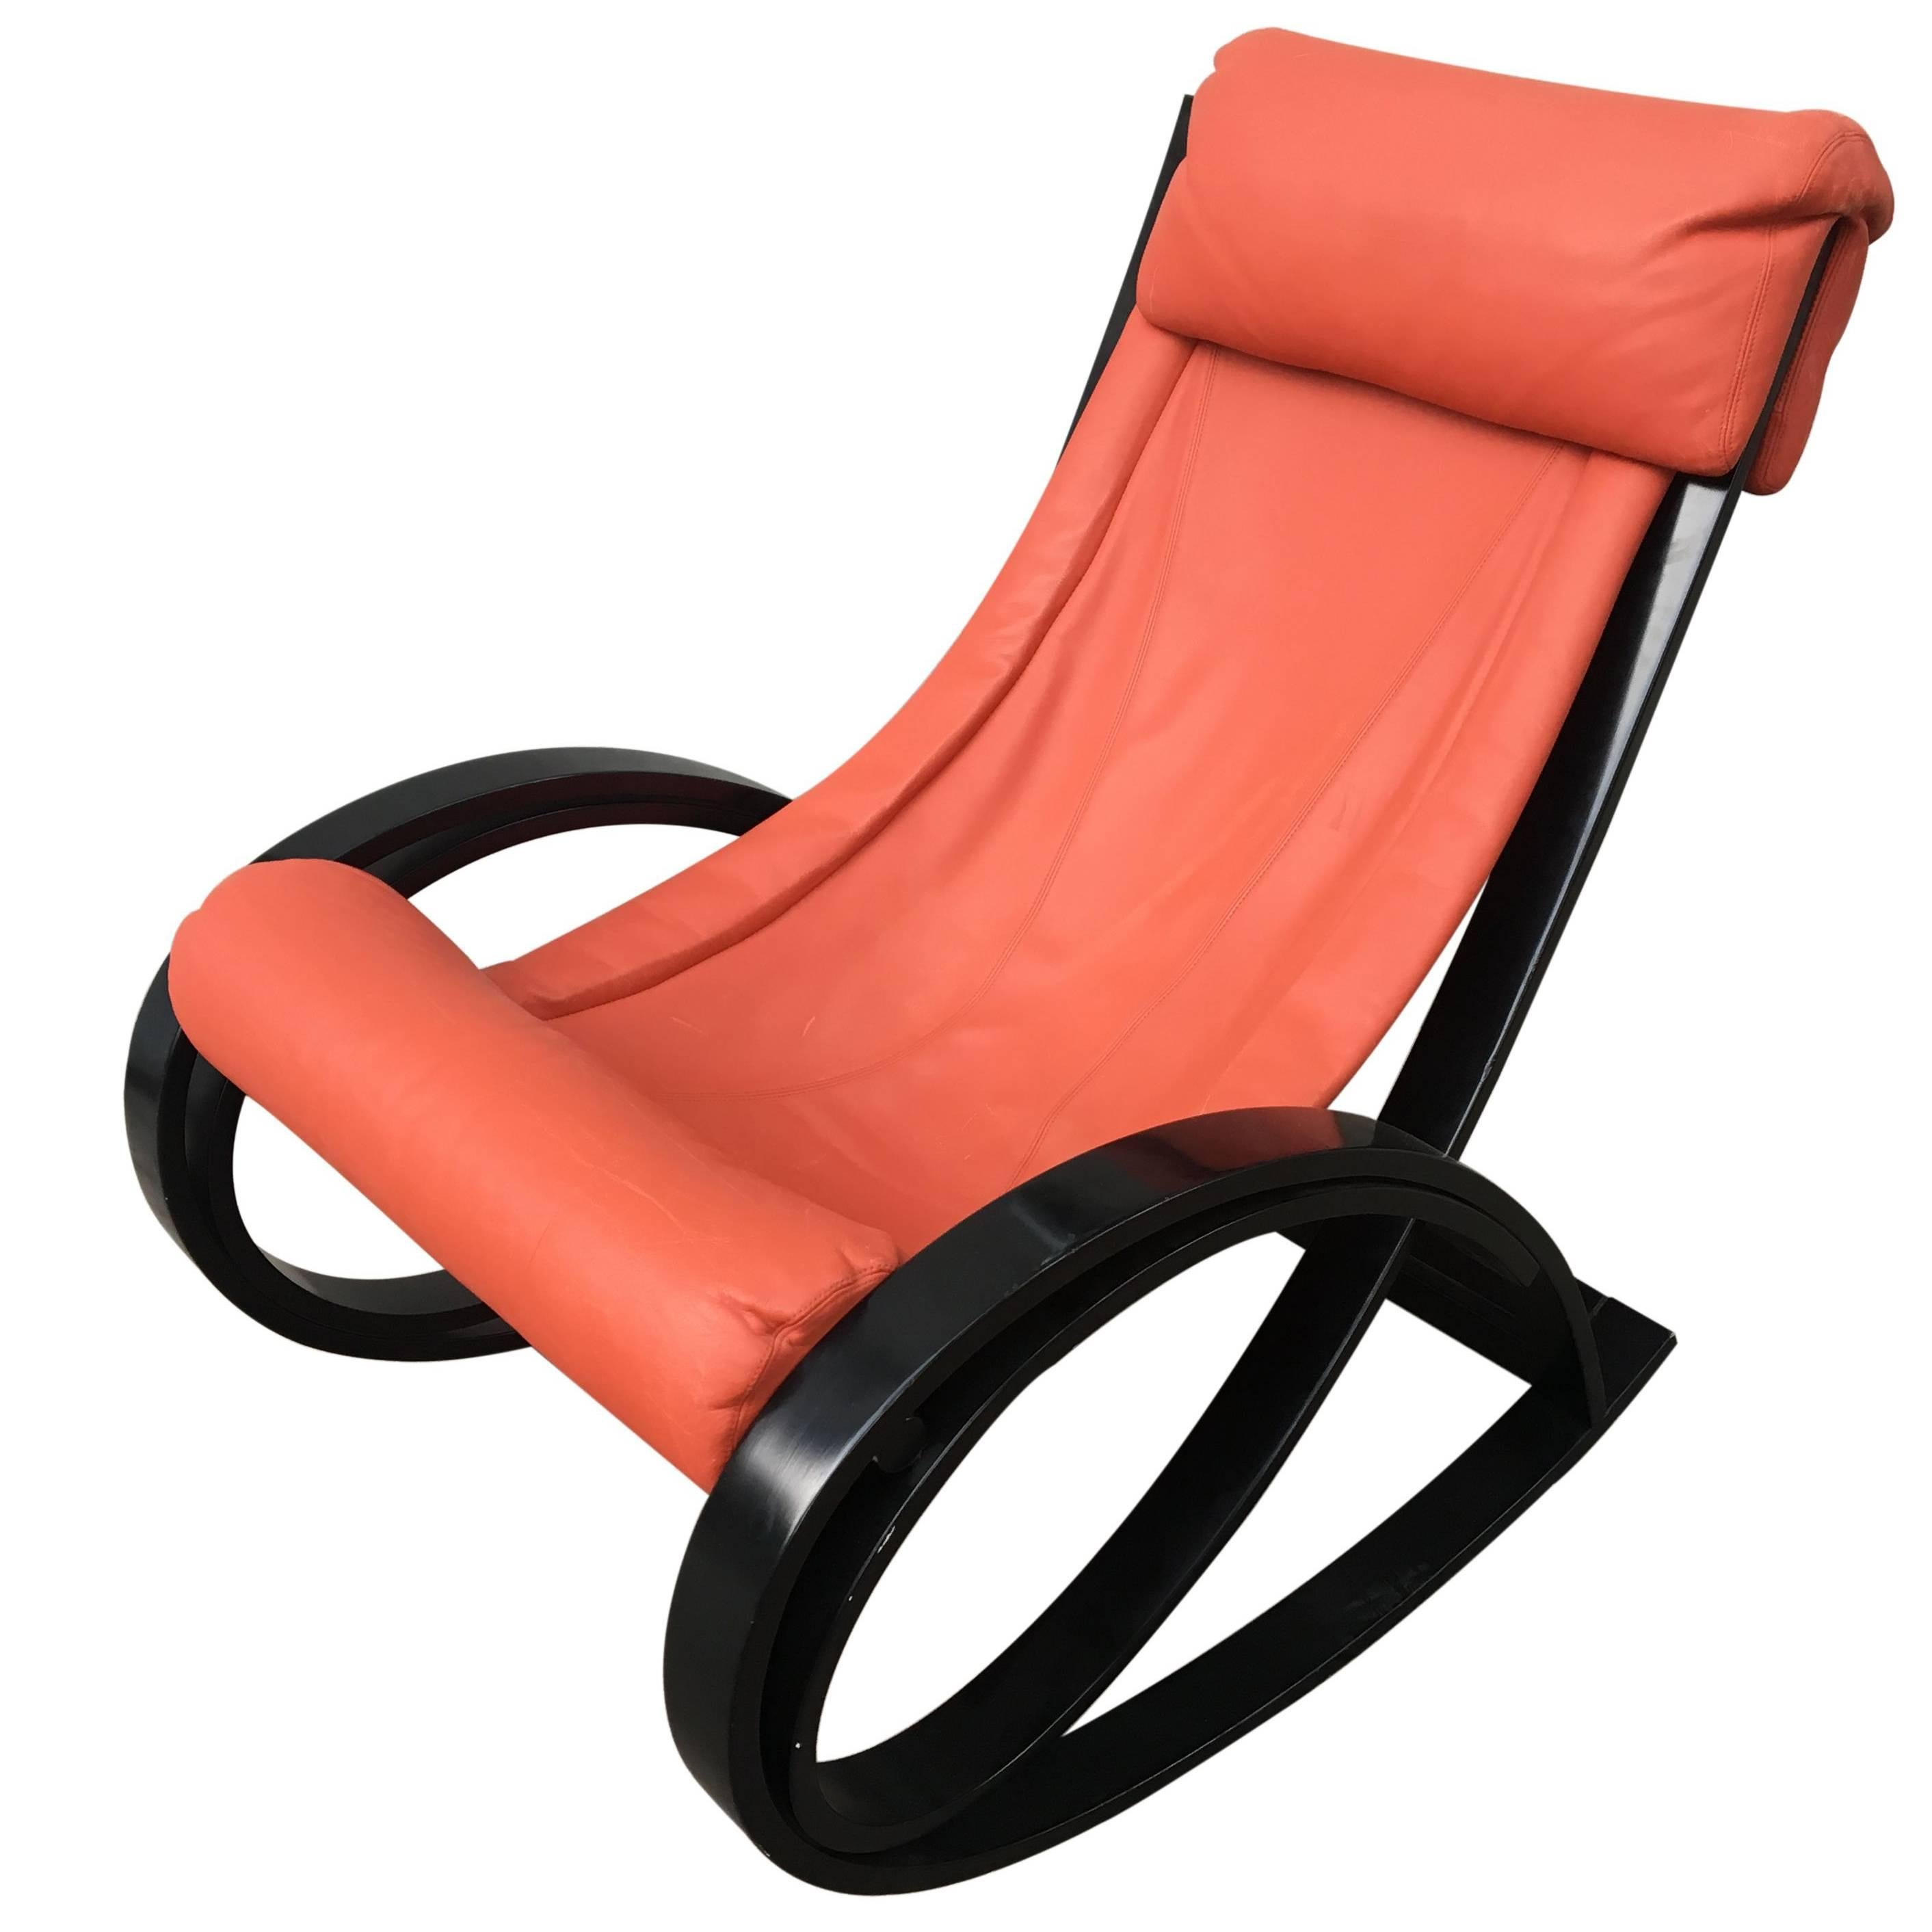 Italian Rocking Chair by Gae Aulenti for Poltronova